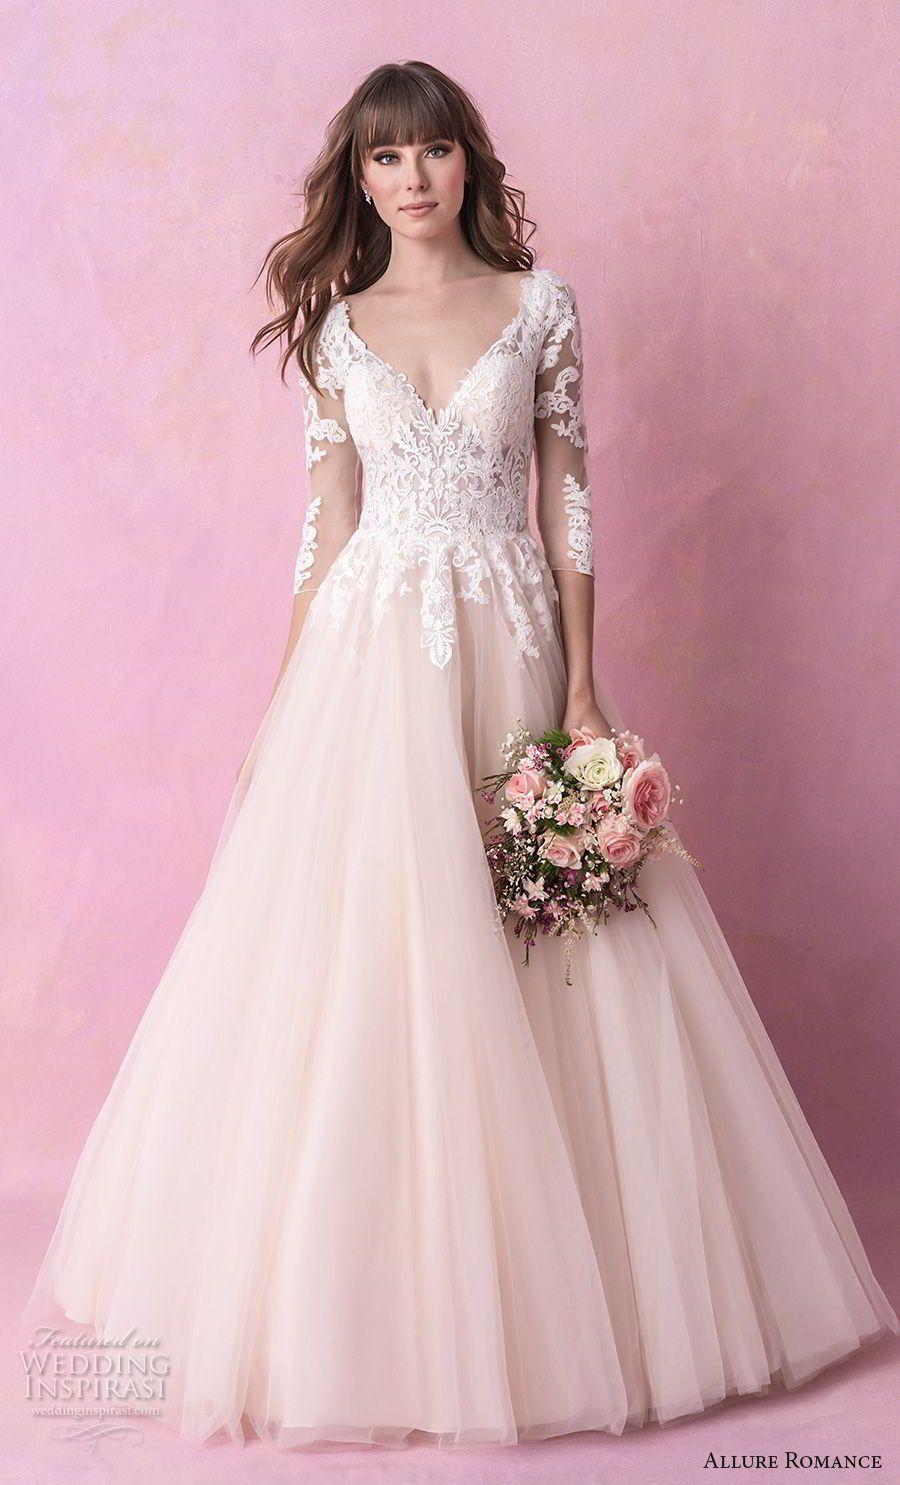 Allure Romance Fall 2018 Wedding Dresses | De novia, Novios y ...